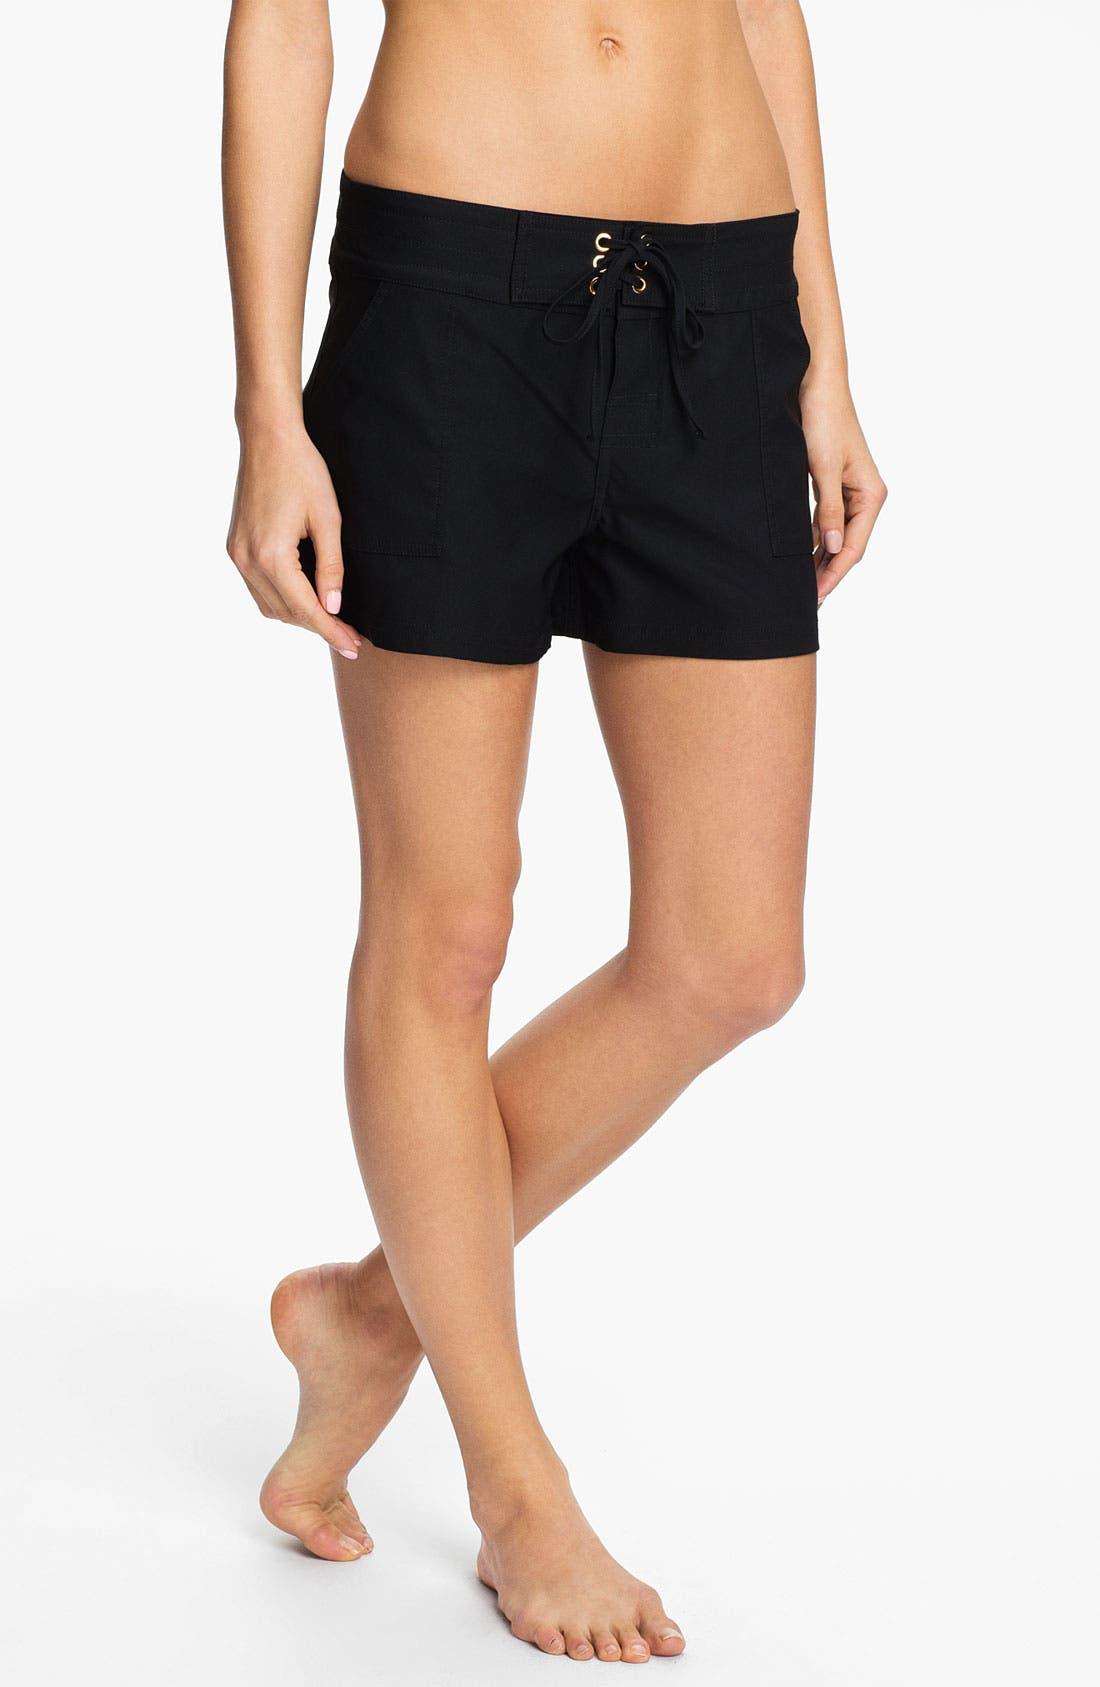 LA BLANCA 'Boardwalk' Shorts